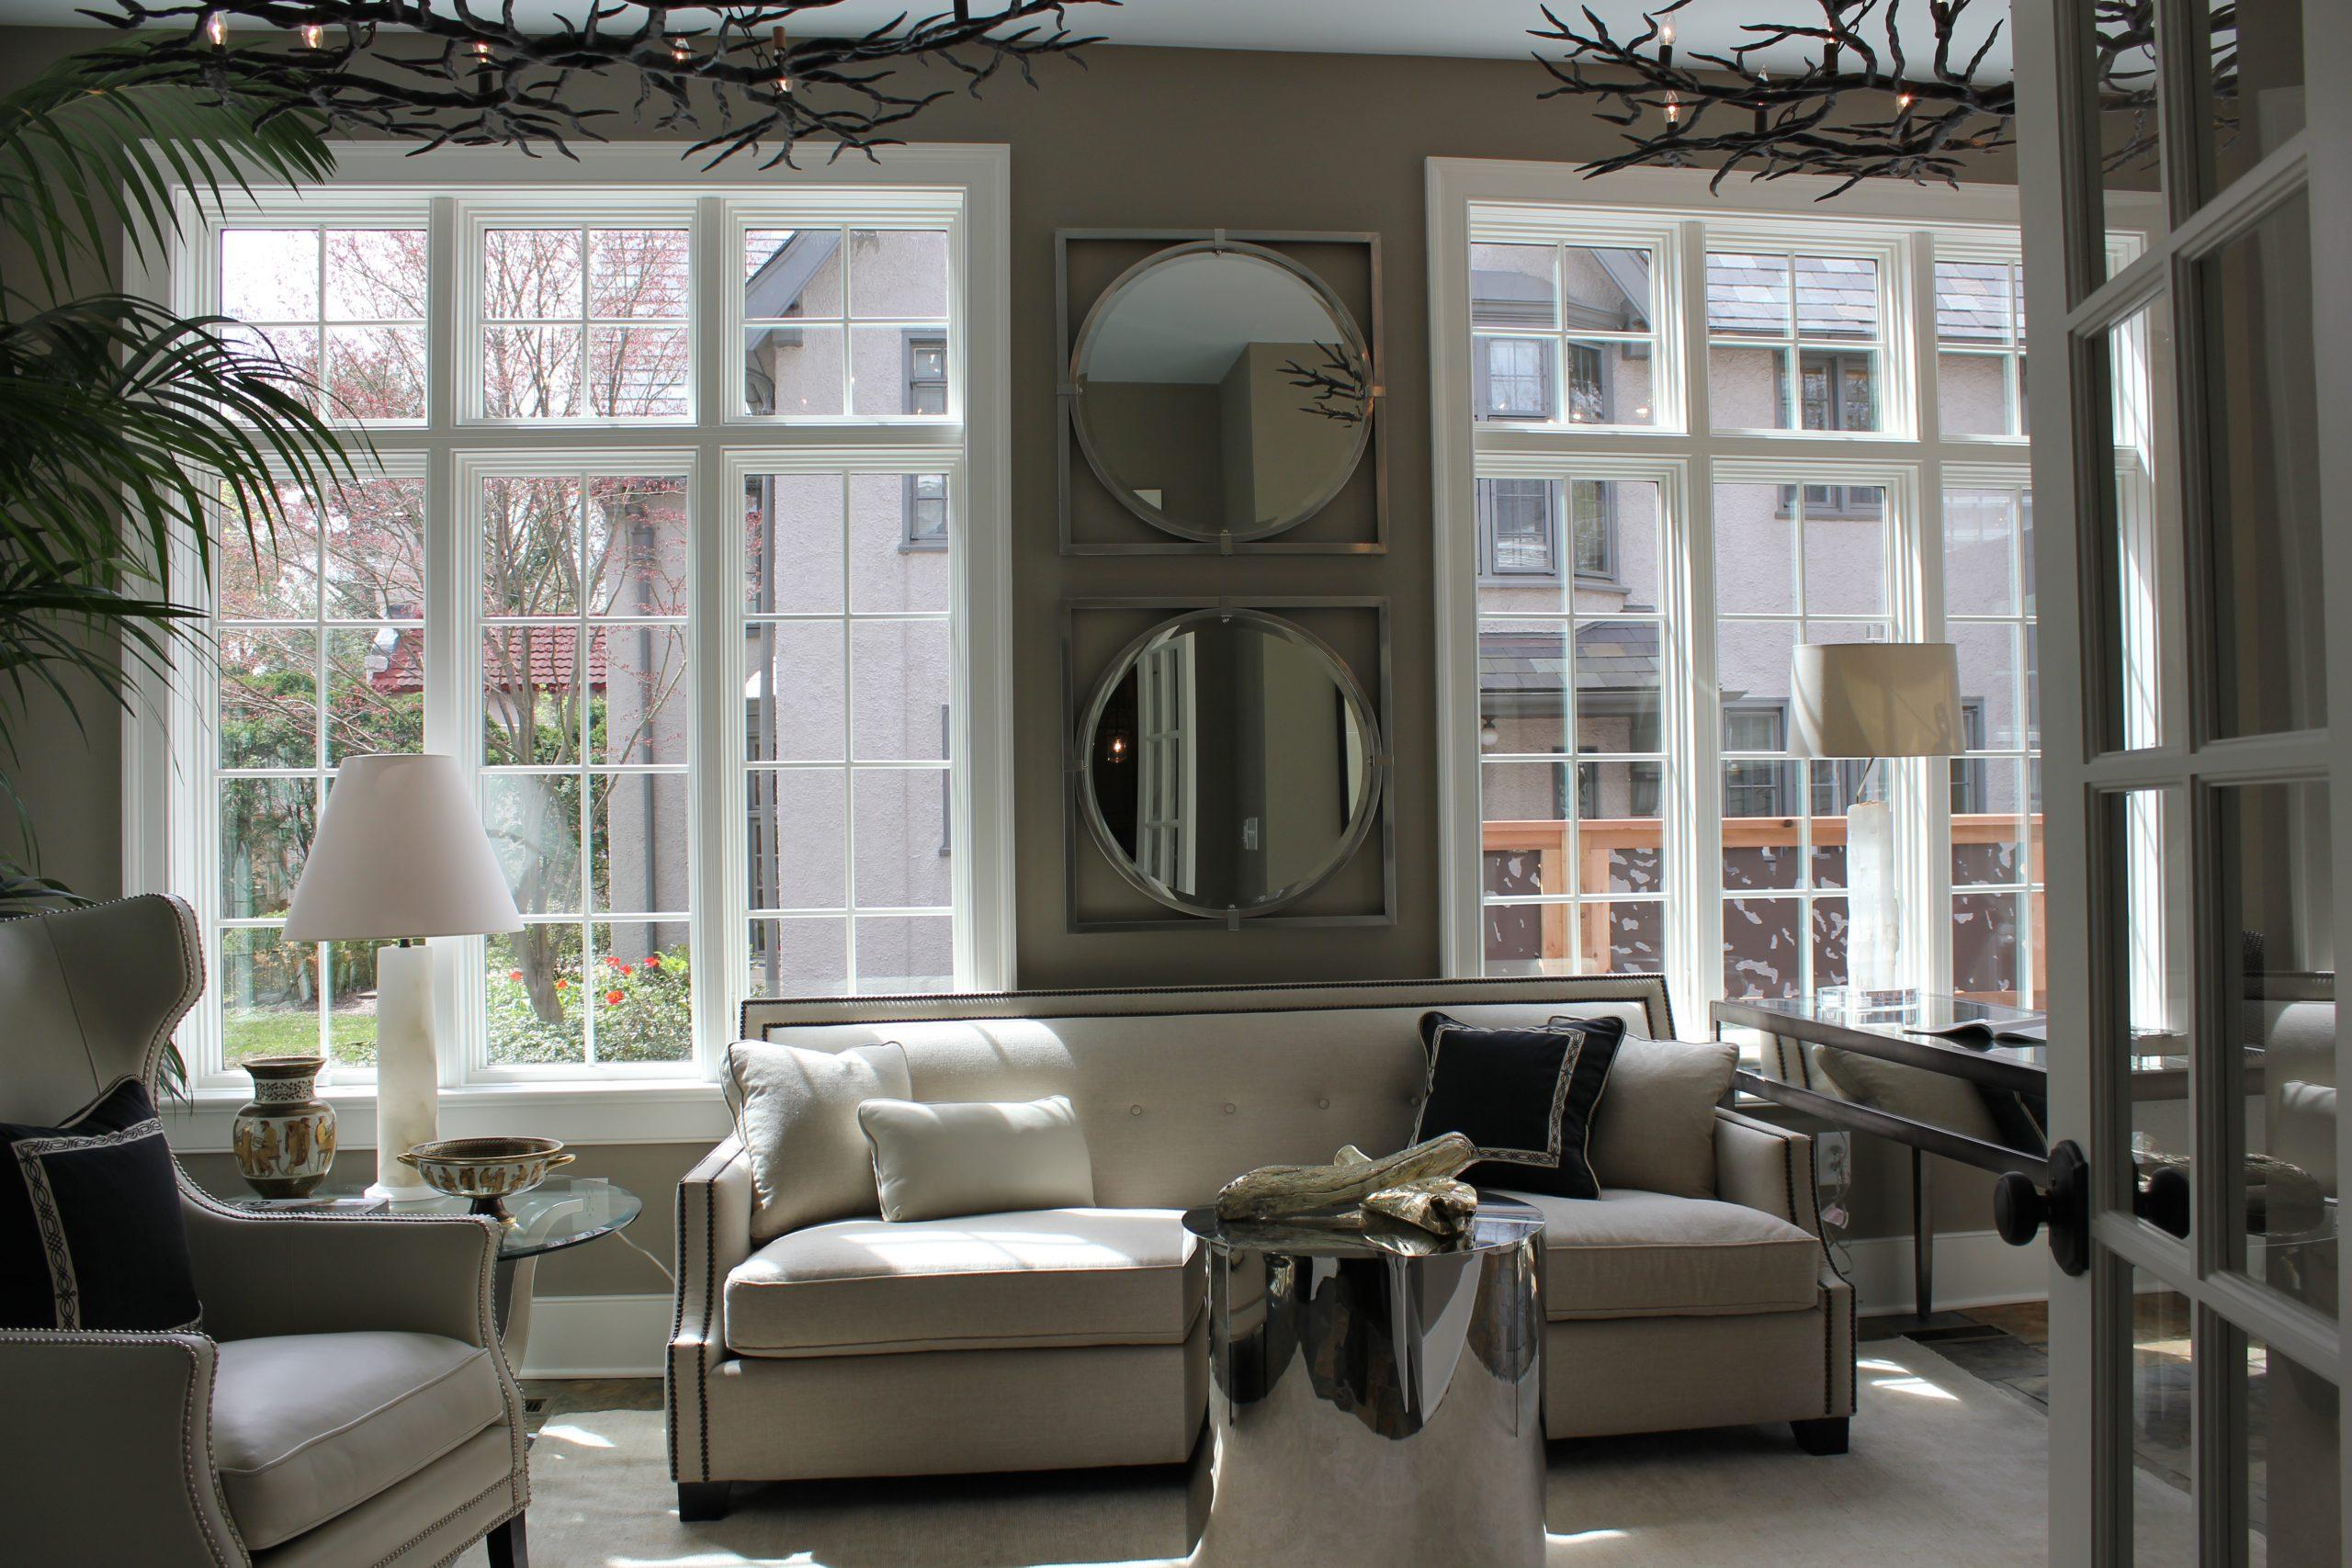 city sunroom gray and white colors gray walls white trim huge windows NJ custom sunroom builder